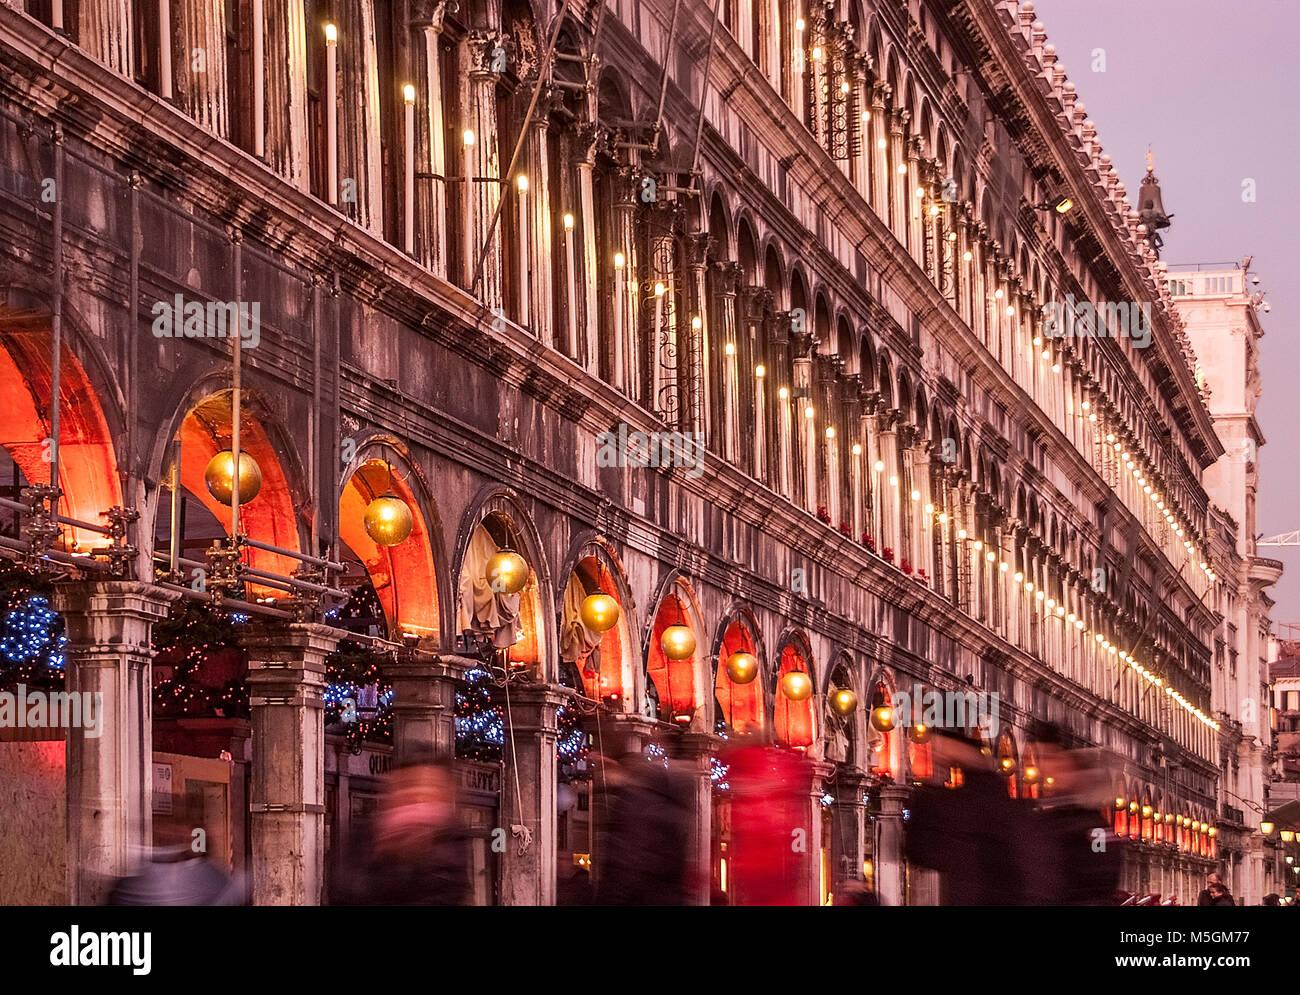 La Piazza San Marco, Venecia, Italia Imagen De Stock